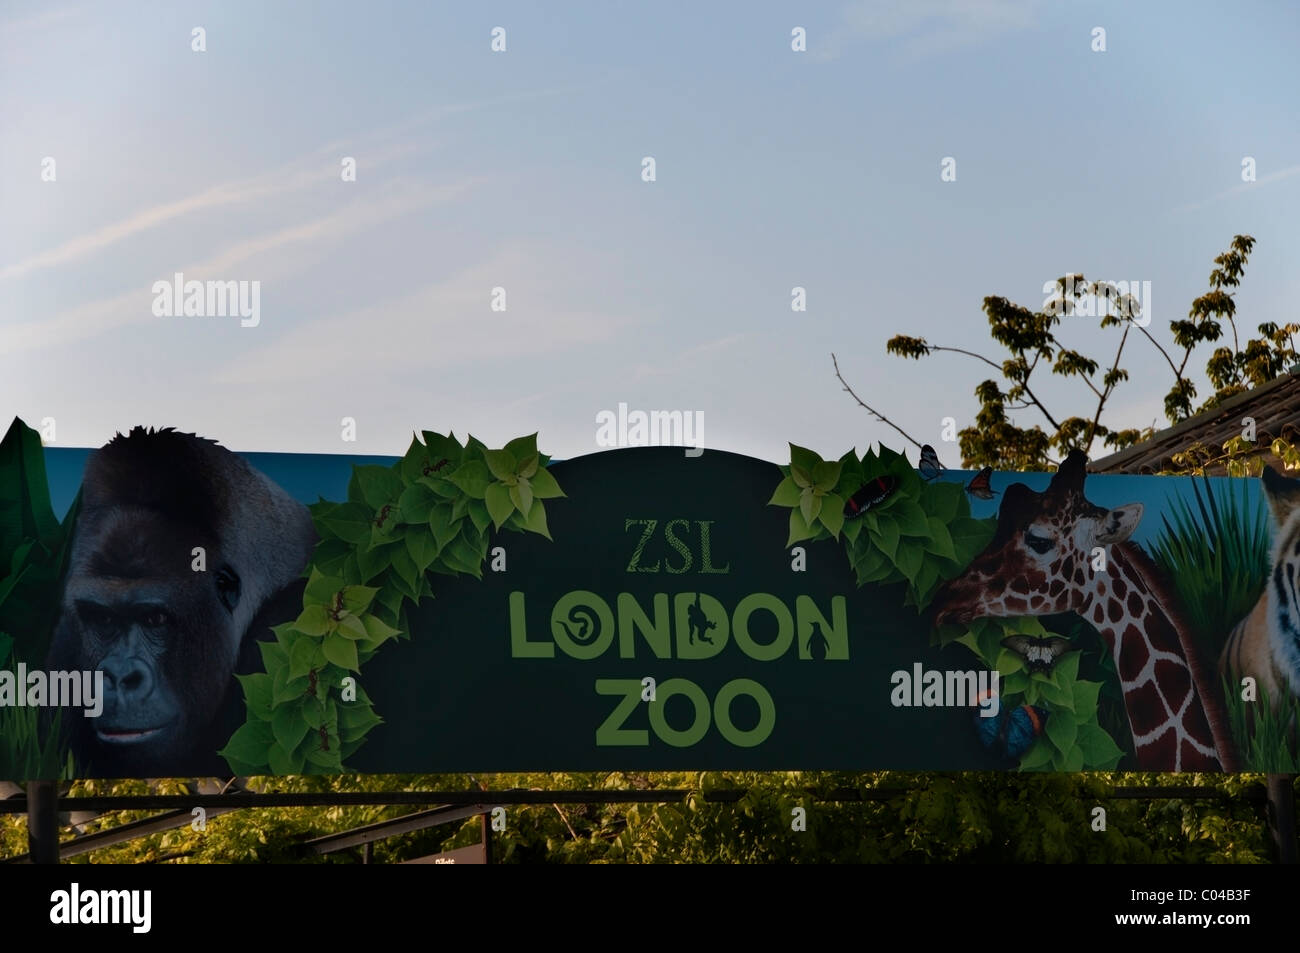 Der Londoner Zoo Zeichen, Nahaufnahme, zoologischen Gärten Eingang, Regents Park, England, UK, Europa, EU Stockbild